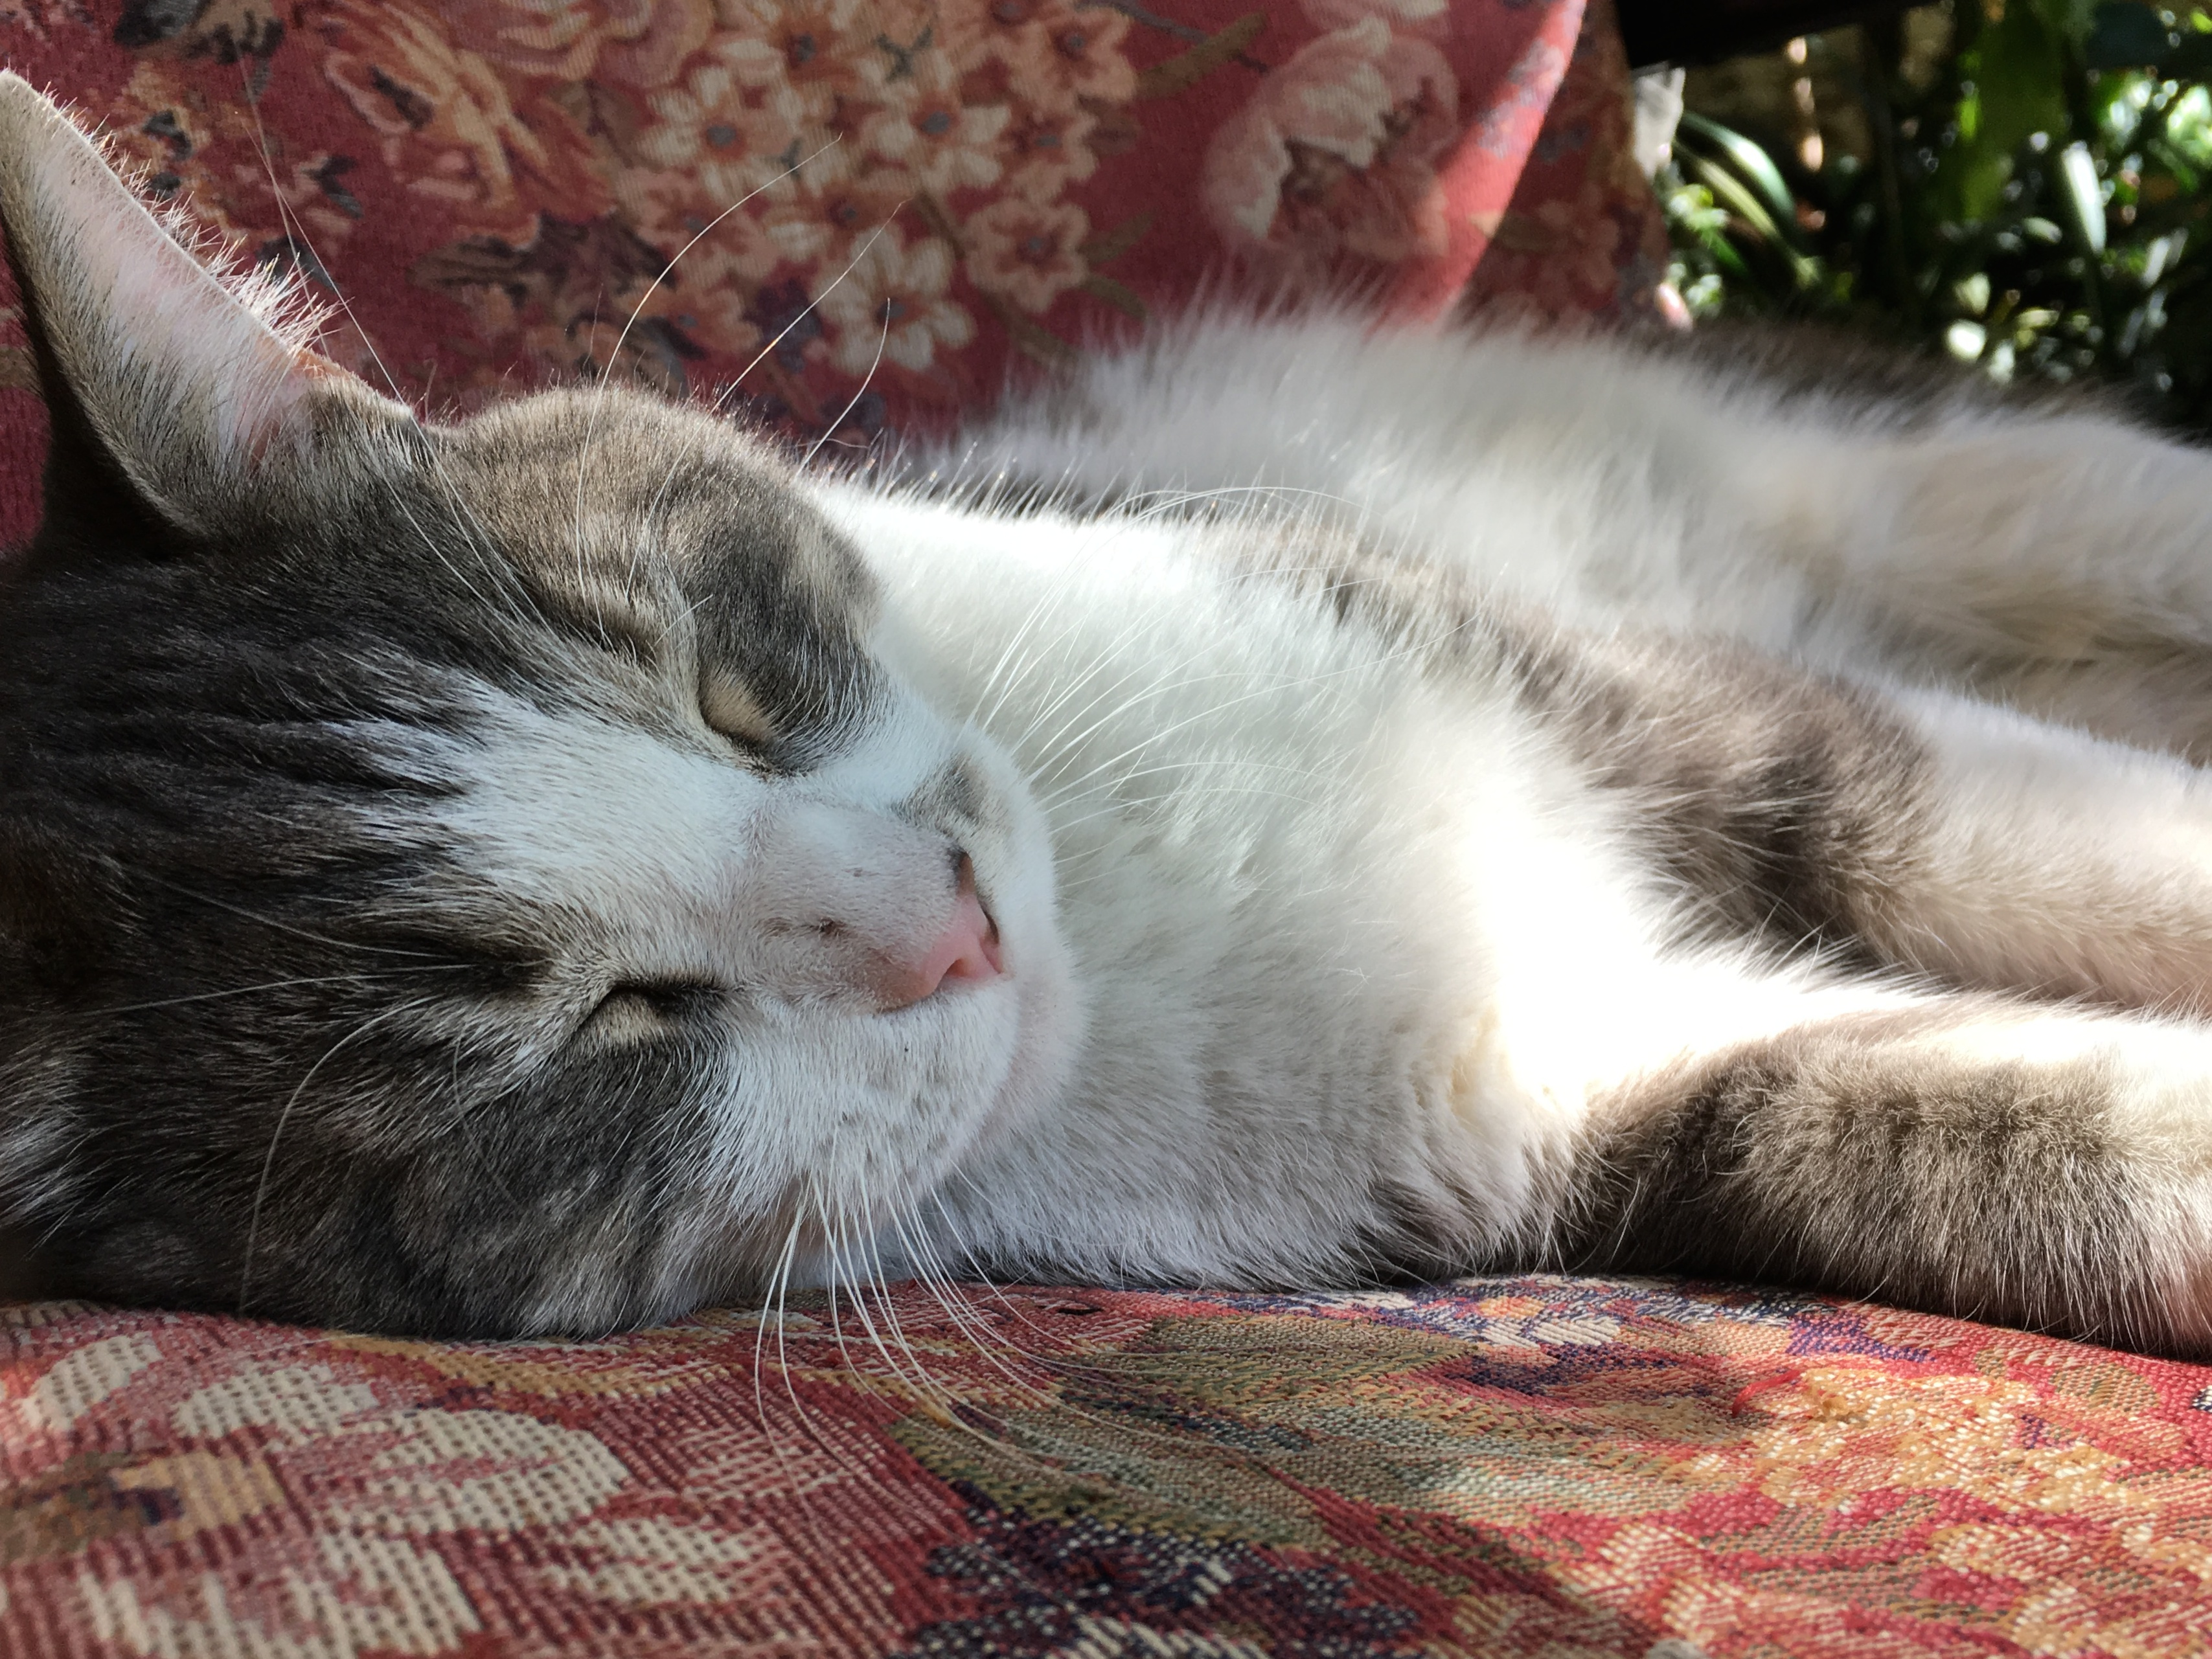 It's a hard life, bubba photo